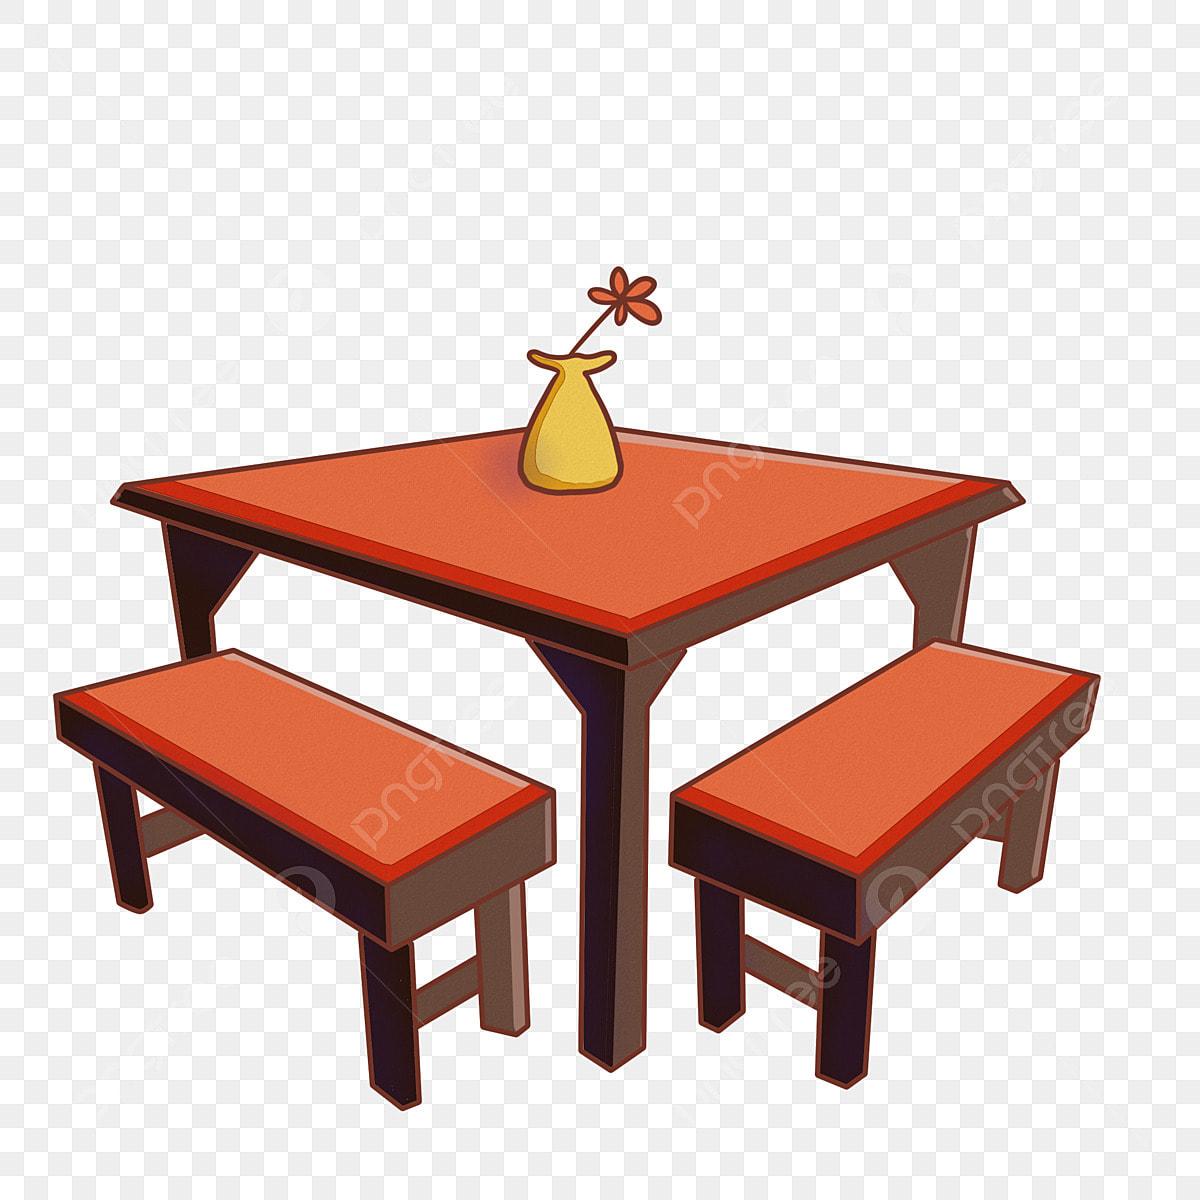 Furniture Table Cartoon Ilration Orange Dining